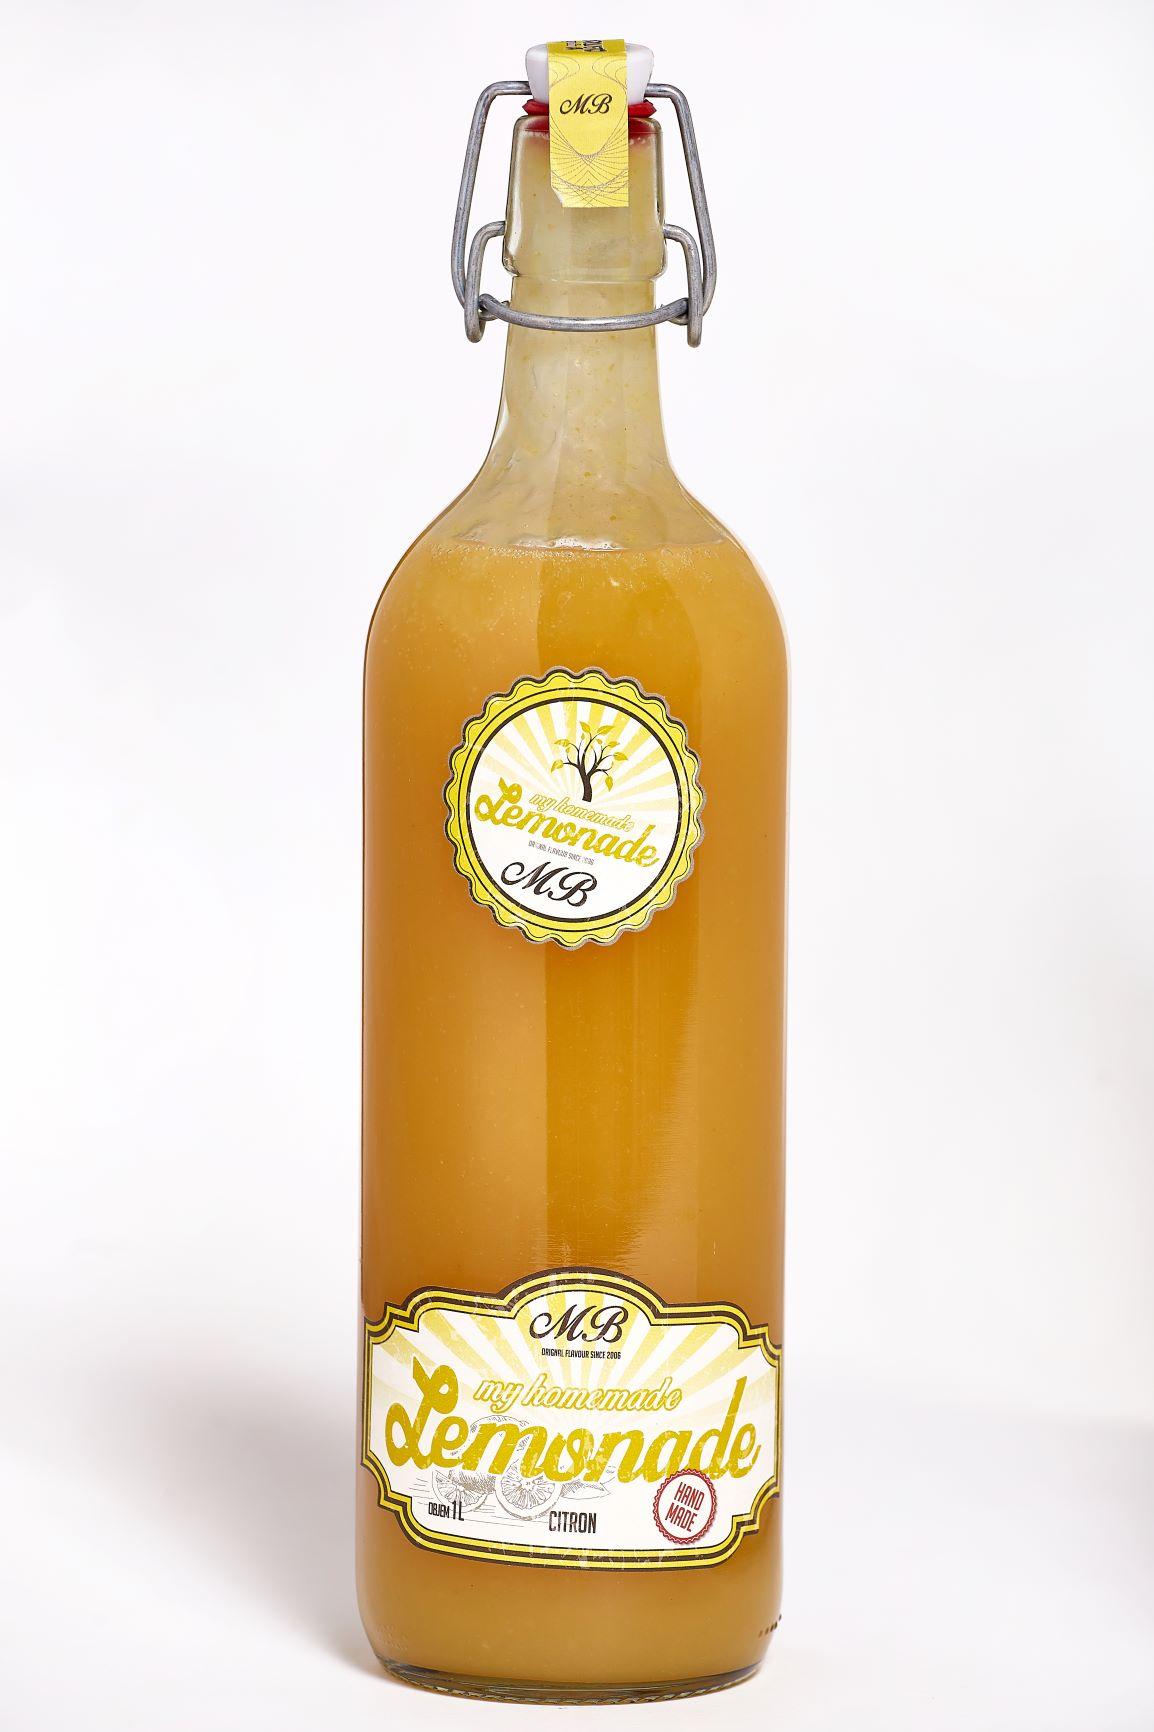 Homemade lemonade Citron